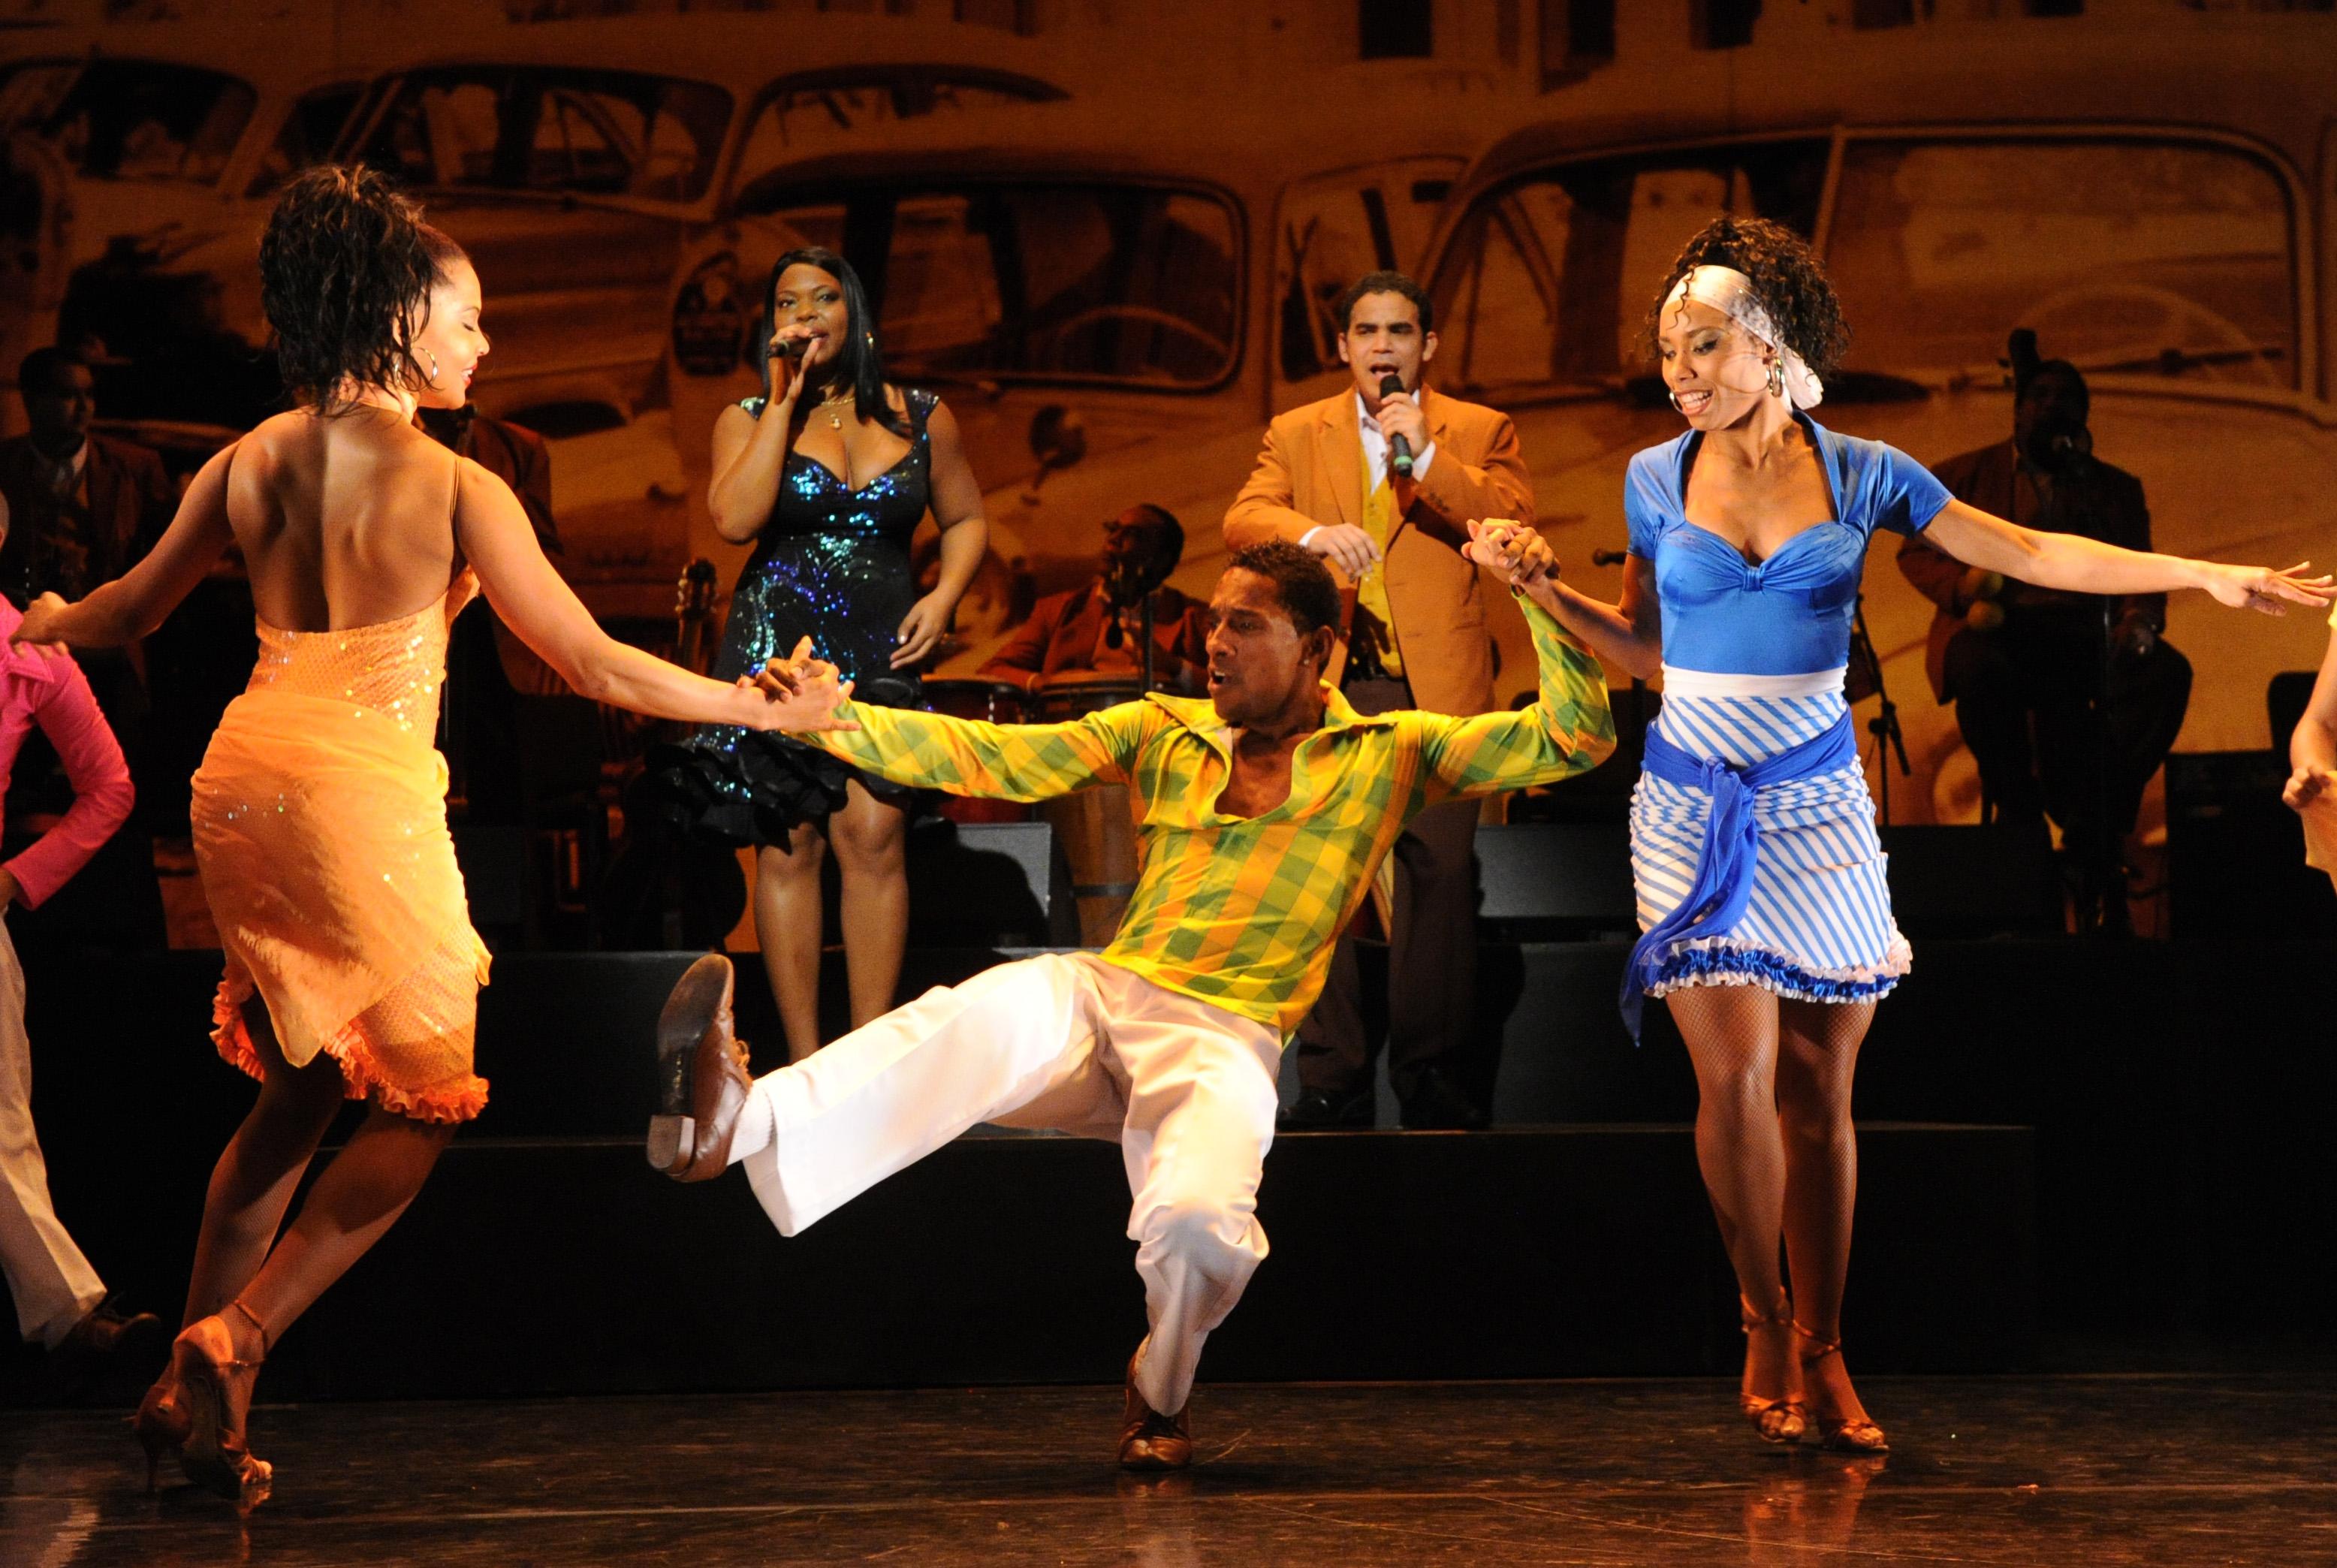 Casino dancers отзывы azartmania casino